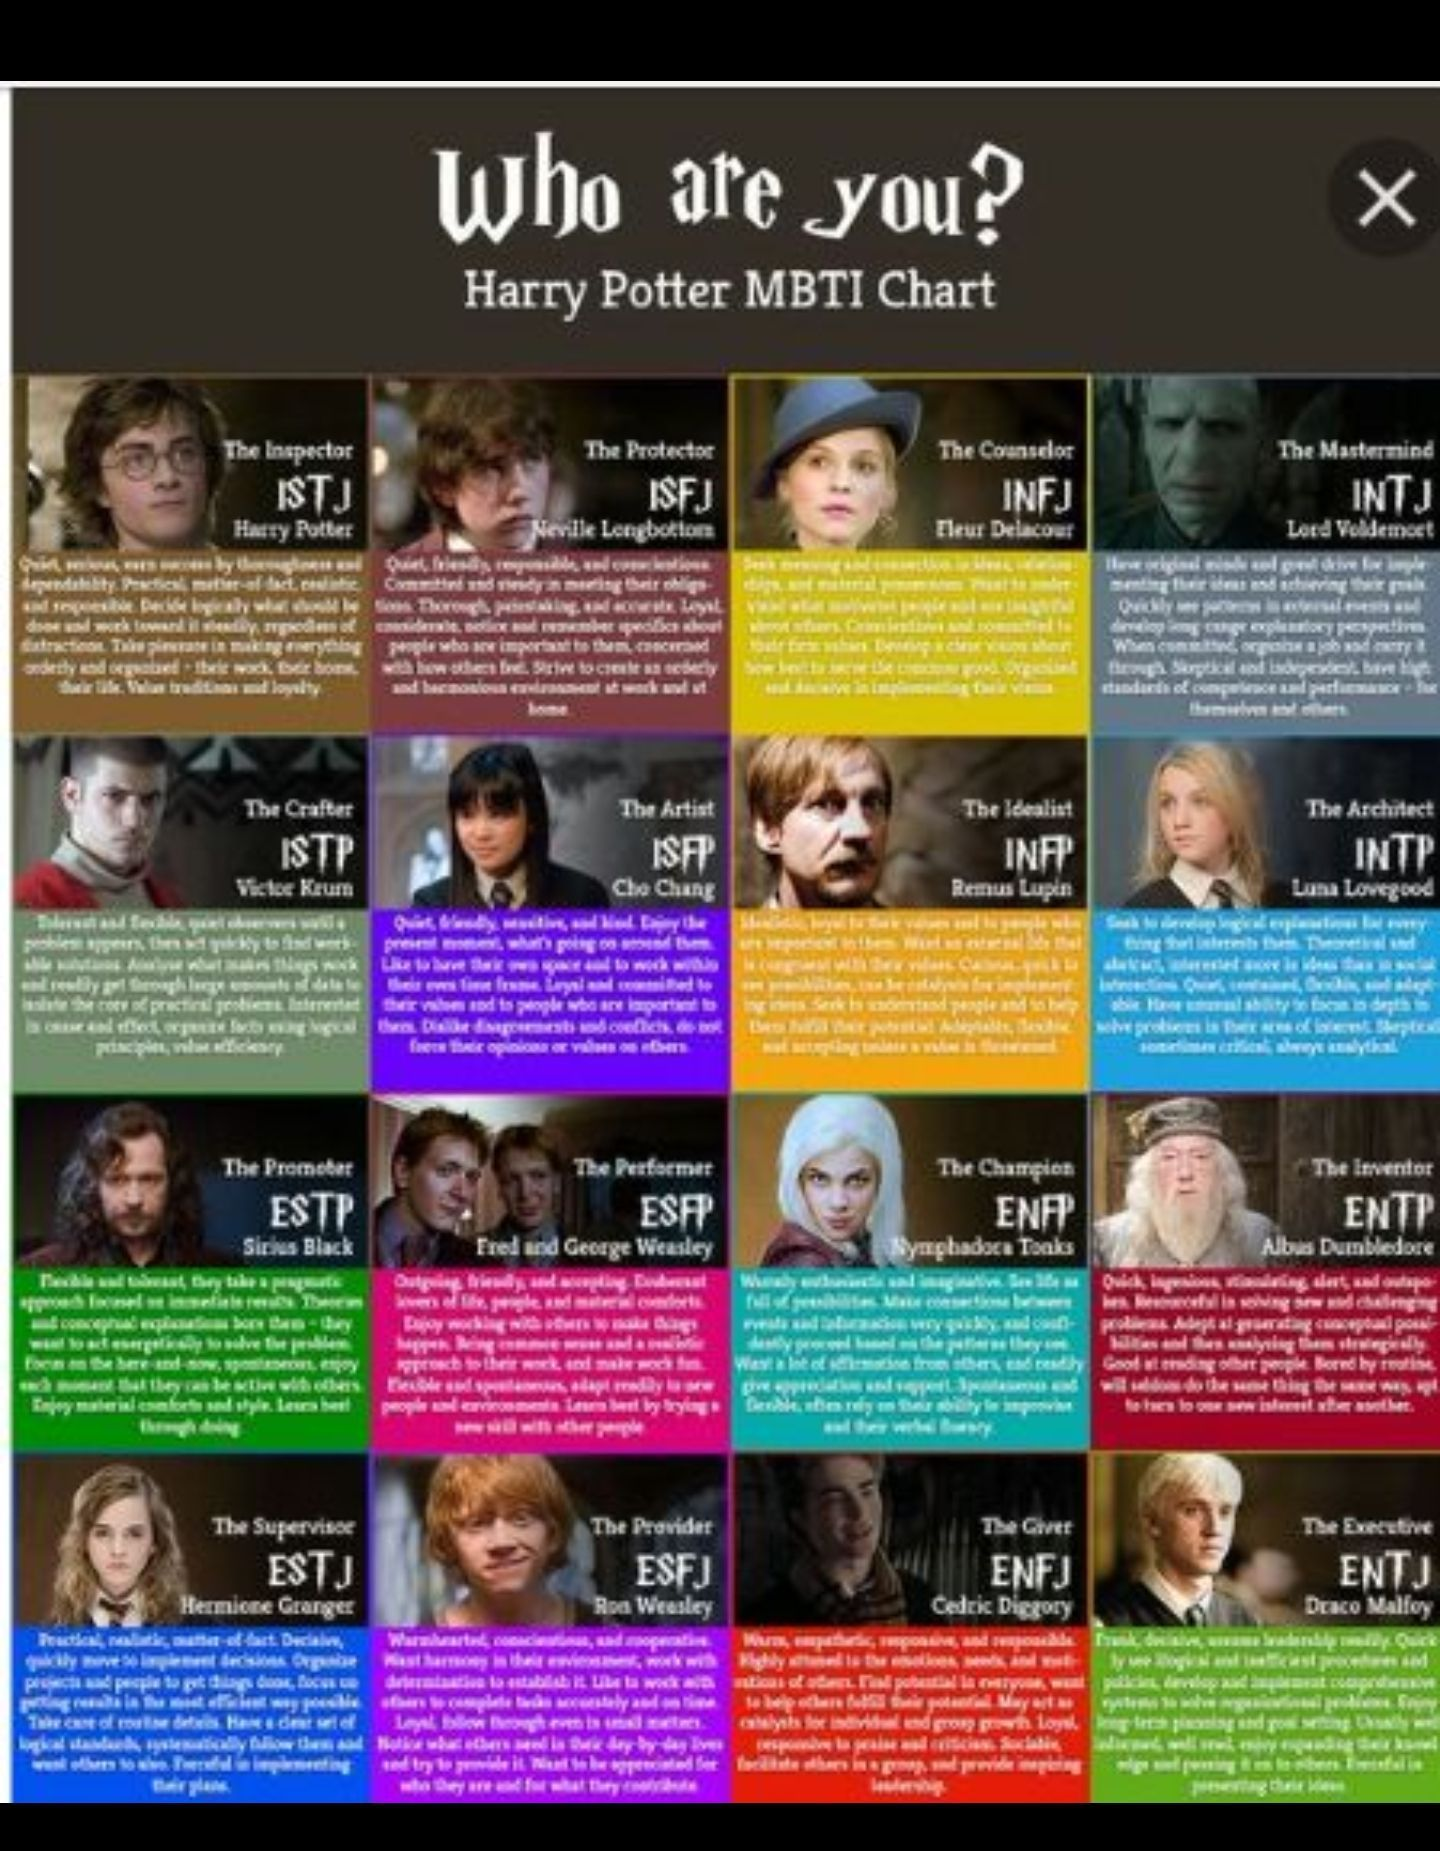 Mbti بعض أنماط شخصيات أنماط Mbti في فيلم هاري بوتر Harry Potter Characters Harry Potter Mbti